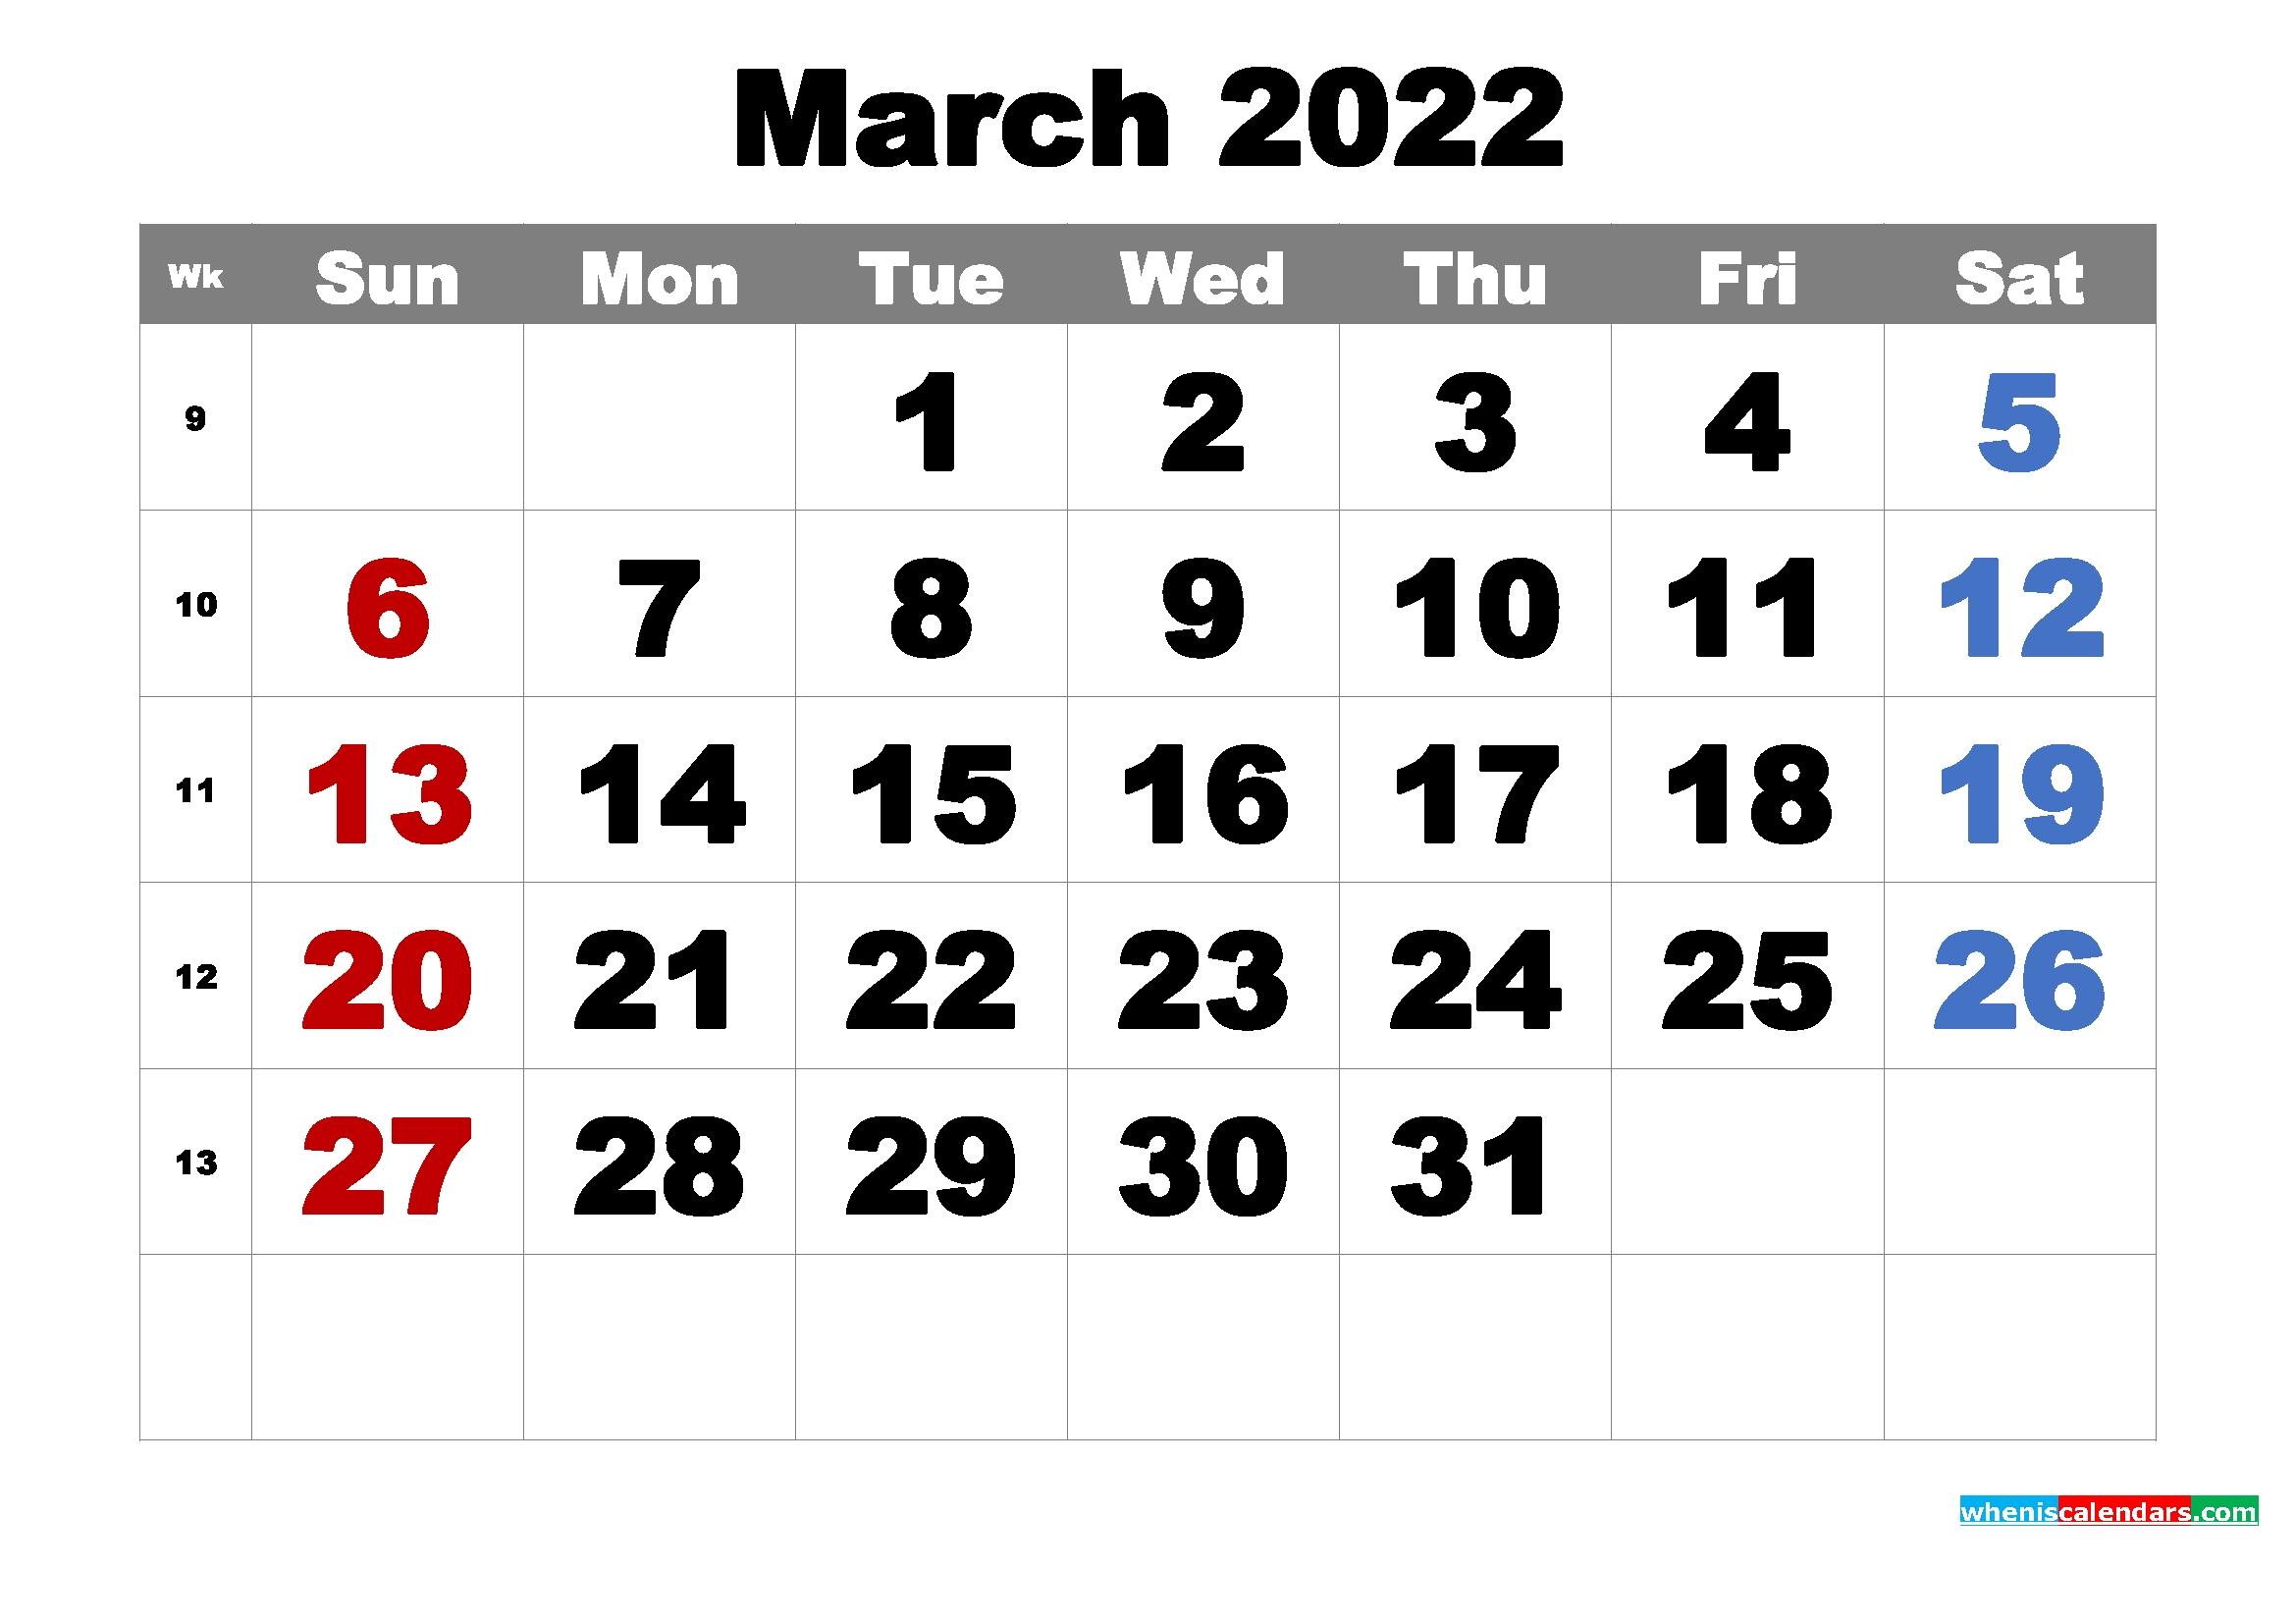 Free Printable March 2022 Calendar Word, Pdf, Image   Free